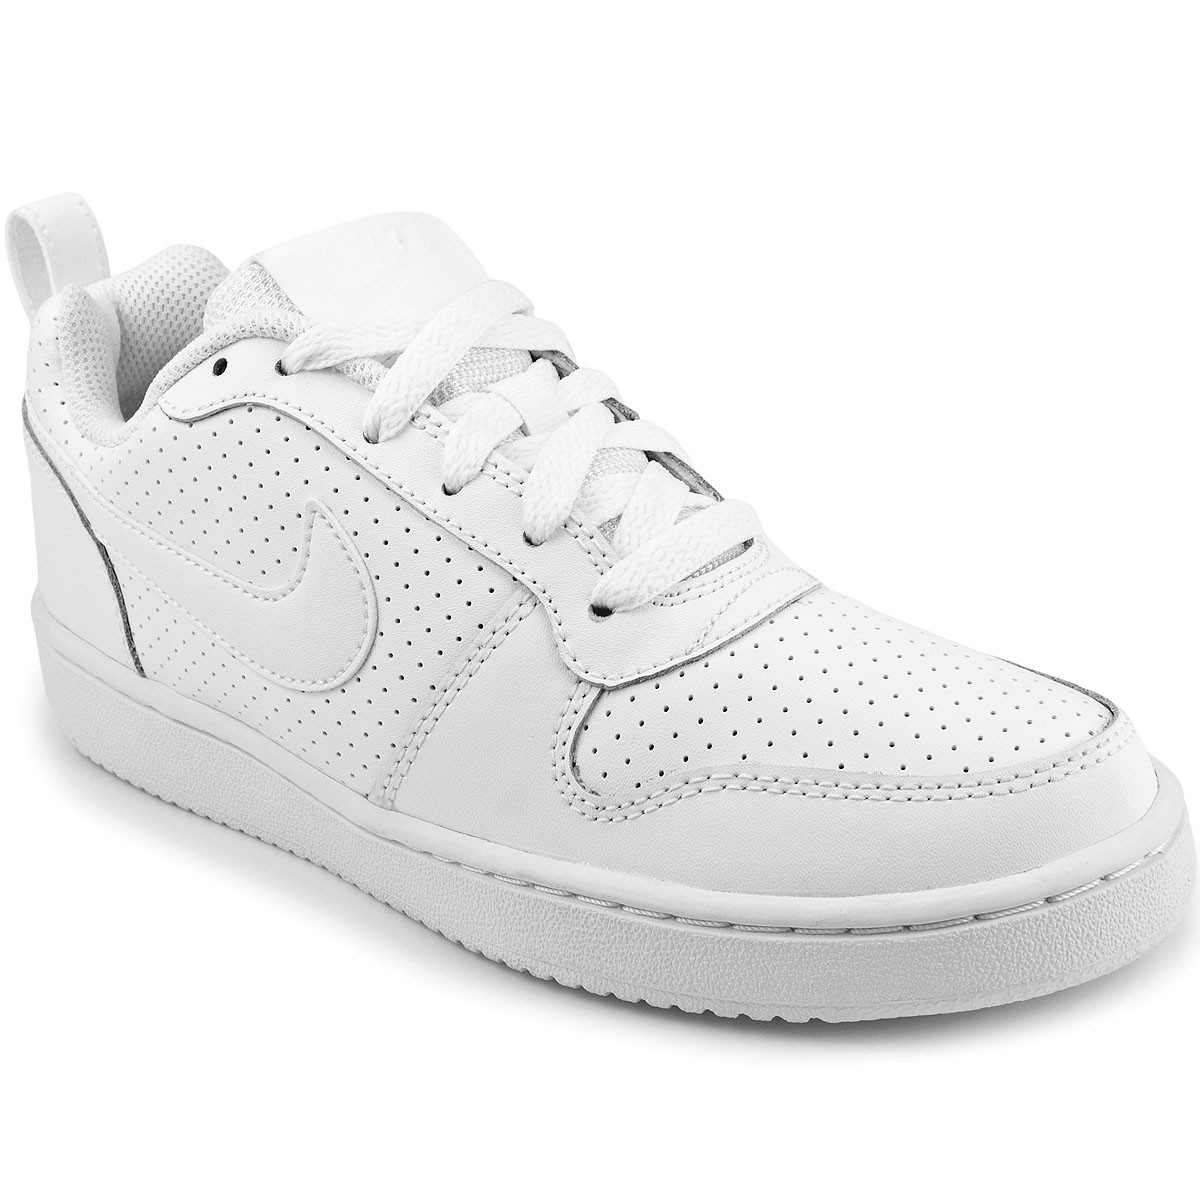 5ed5a08ca4 Tênis Nike Court Borough Low W